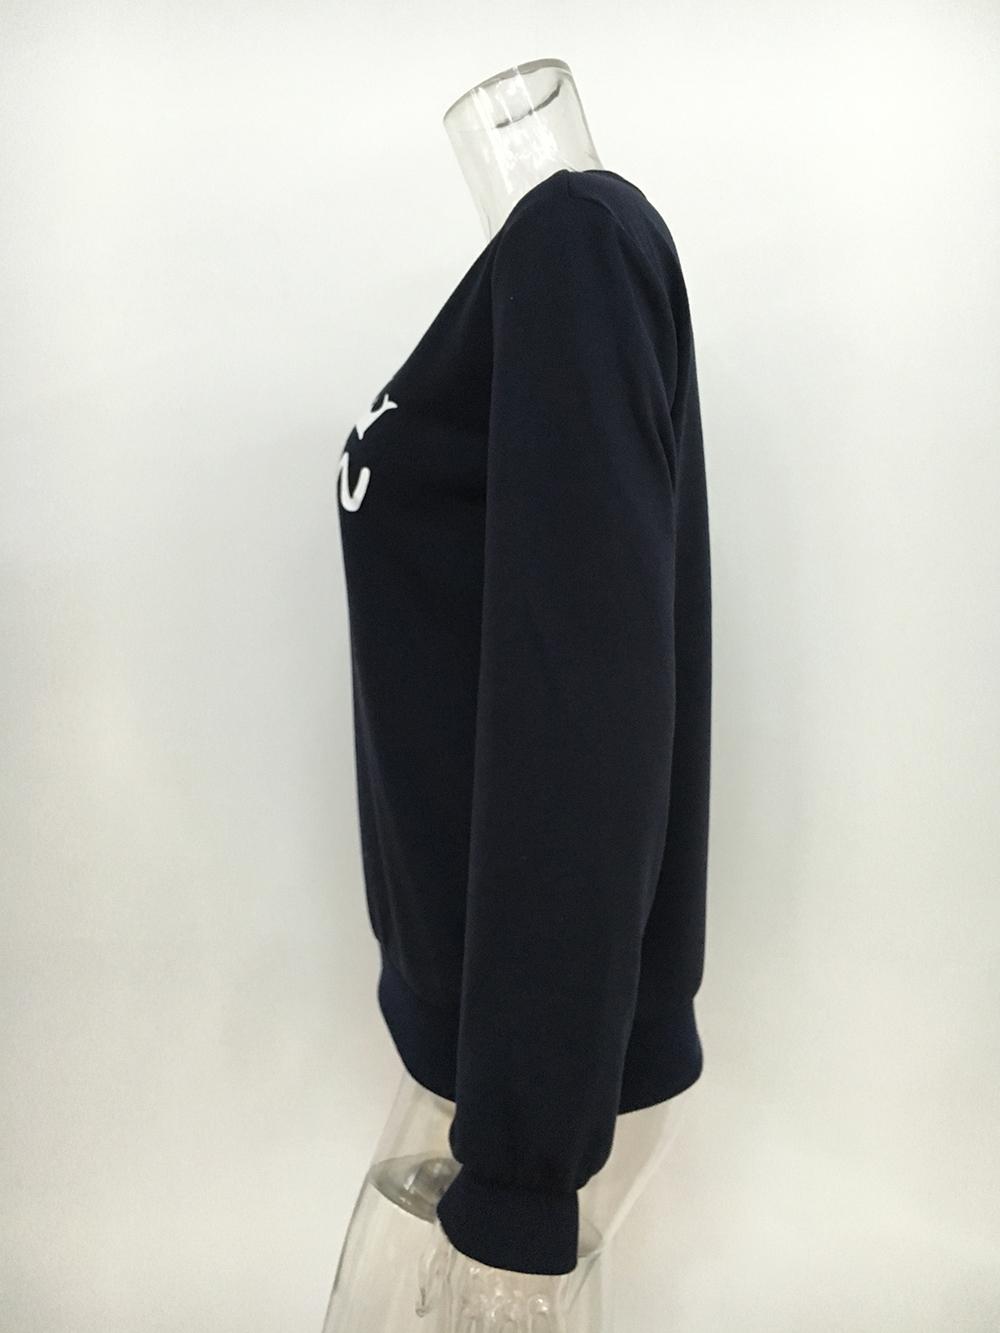 HTB13qmLSXXXXXXLapXXq6xXFXXXp - Women's Hoodies Printed Queen Sweatshirt girlfriend gift ideas